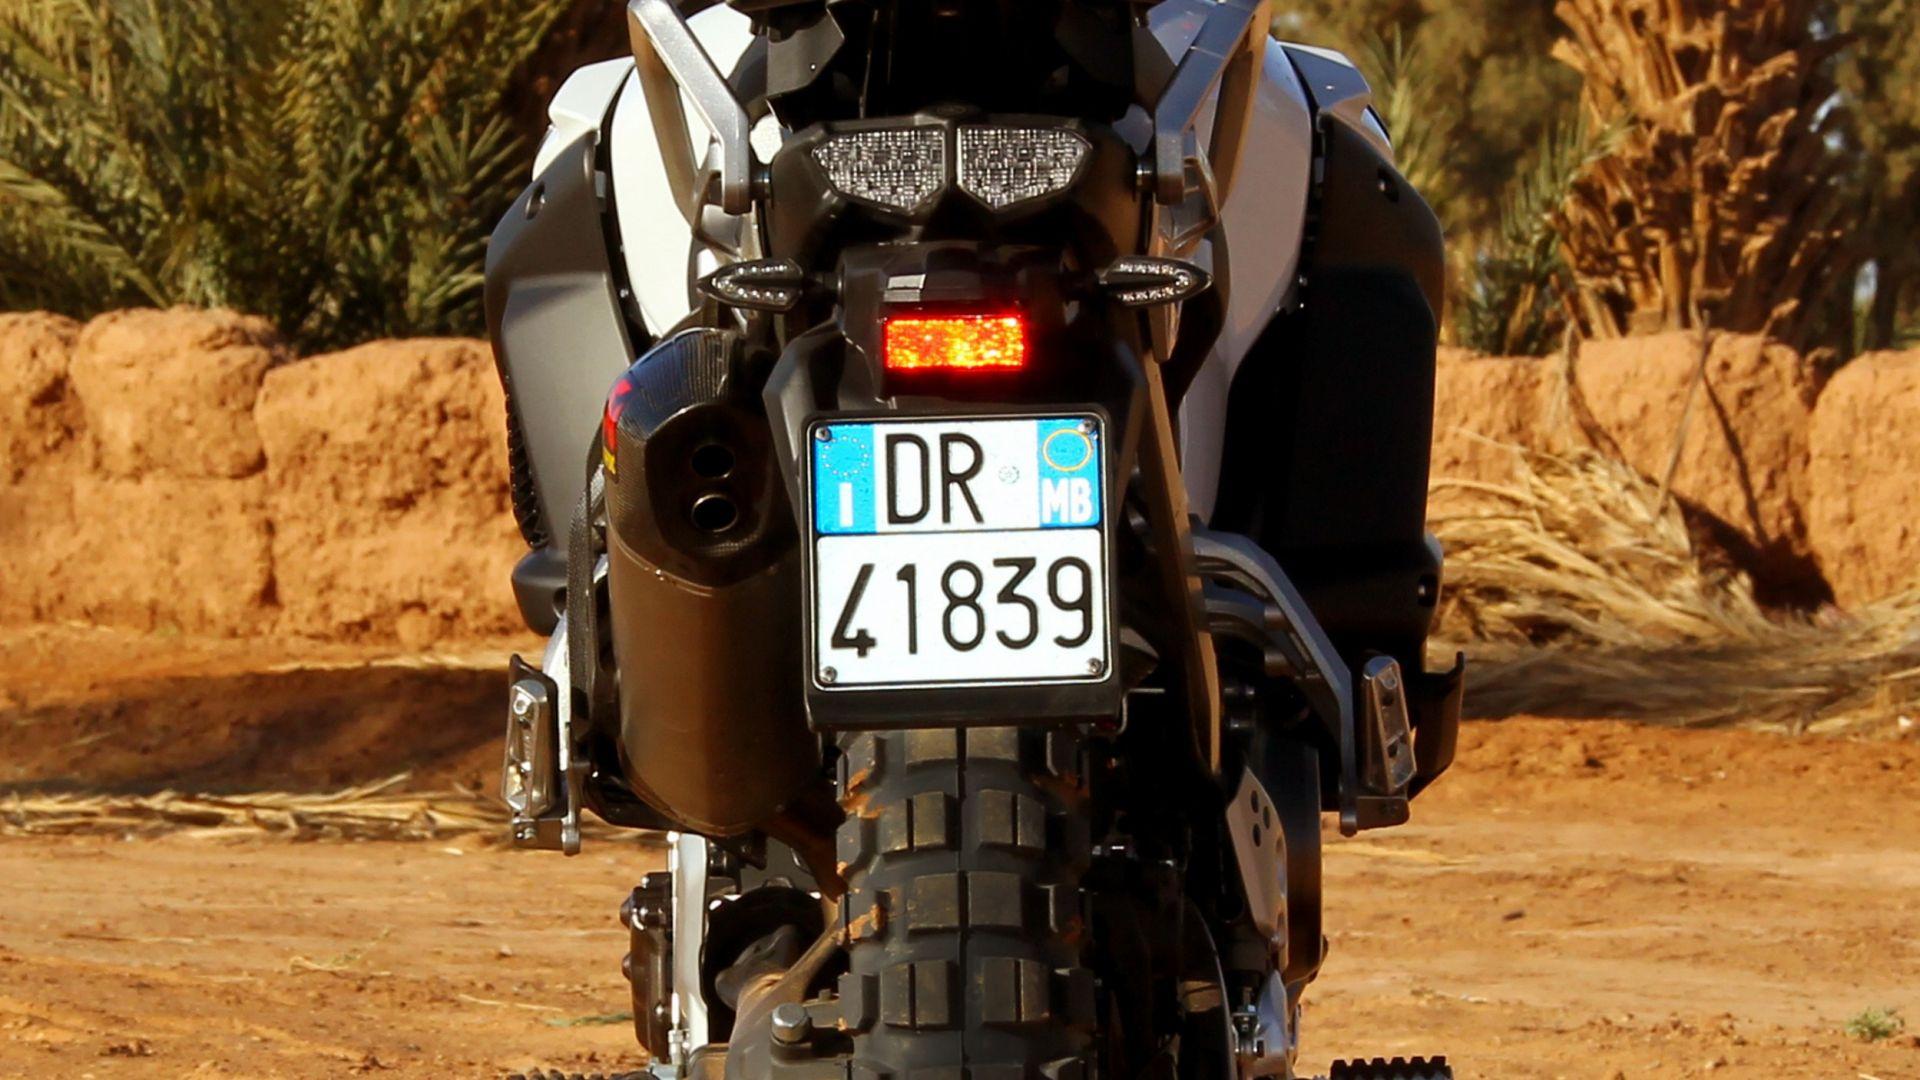 Immagine 11: In Marocco con la Yamaha Super Ténéré